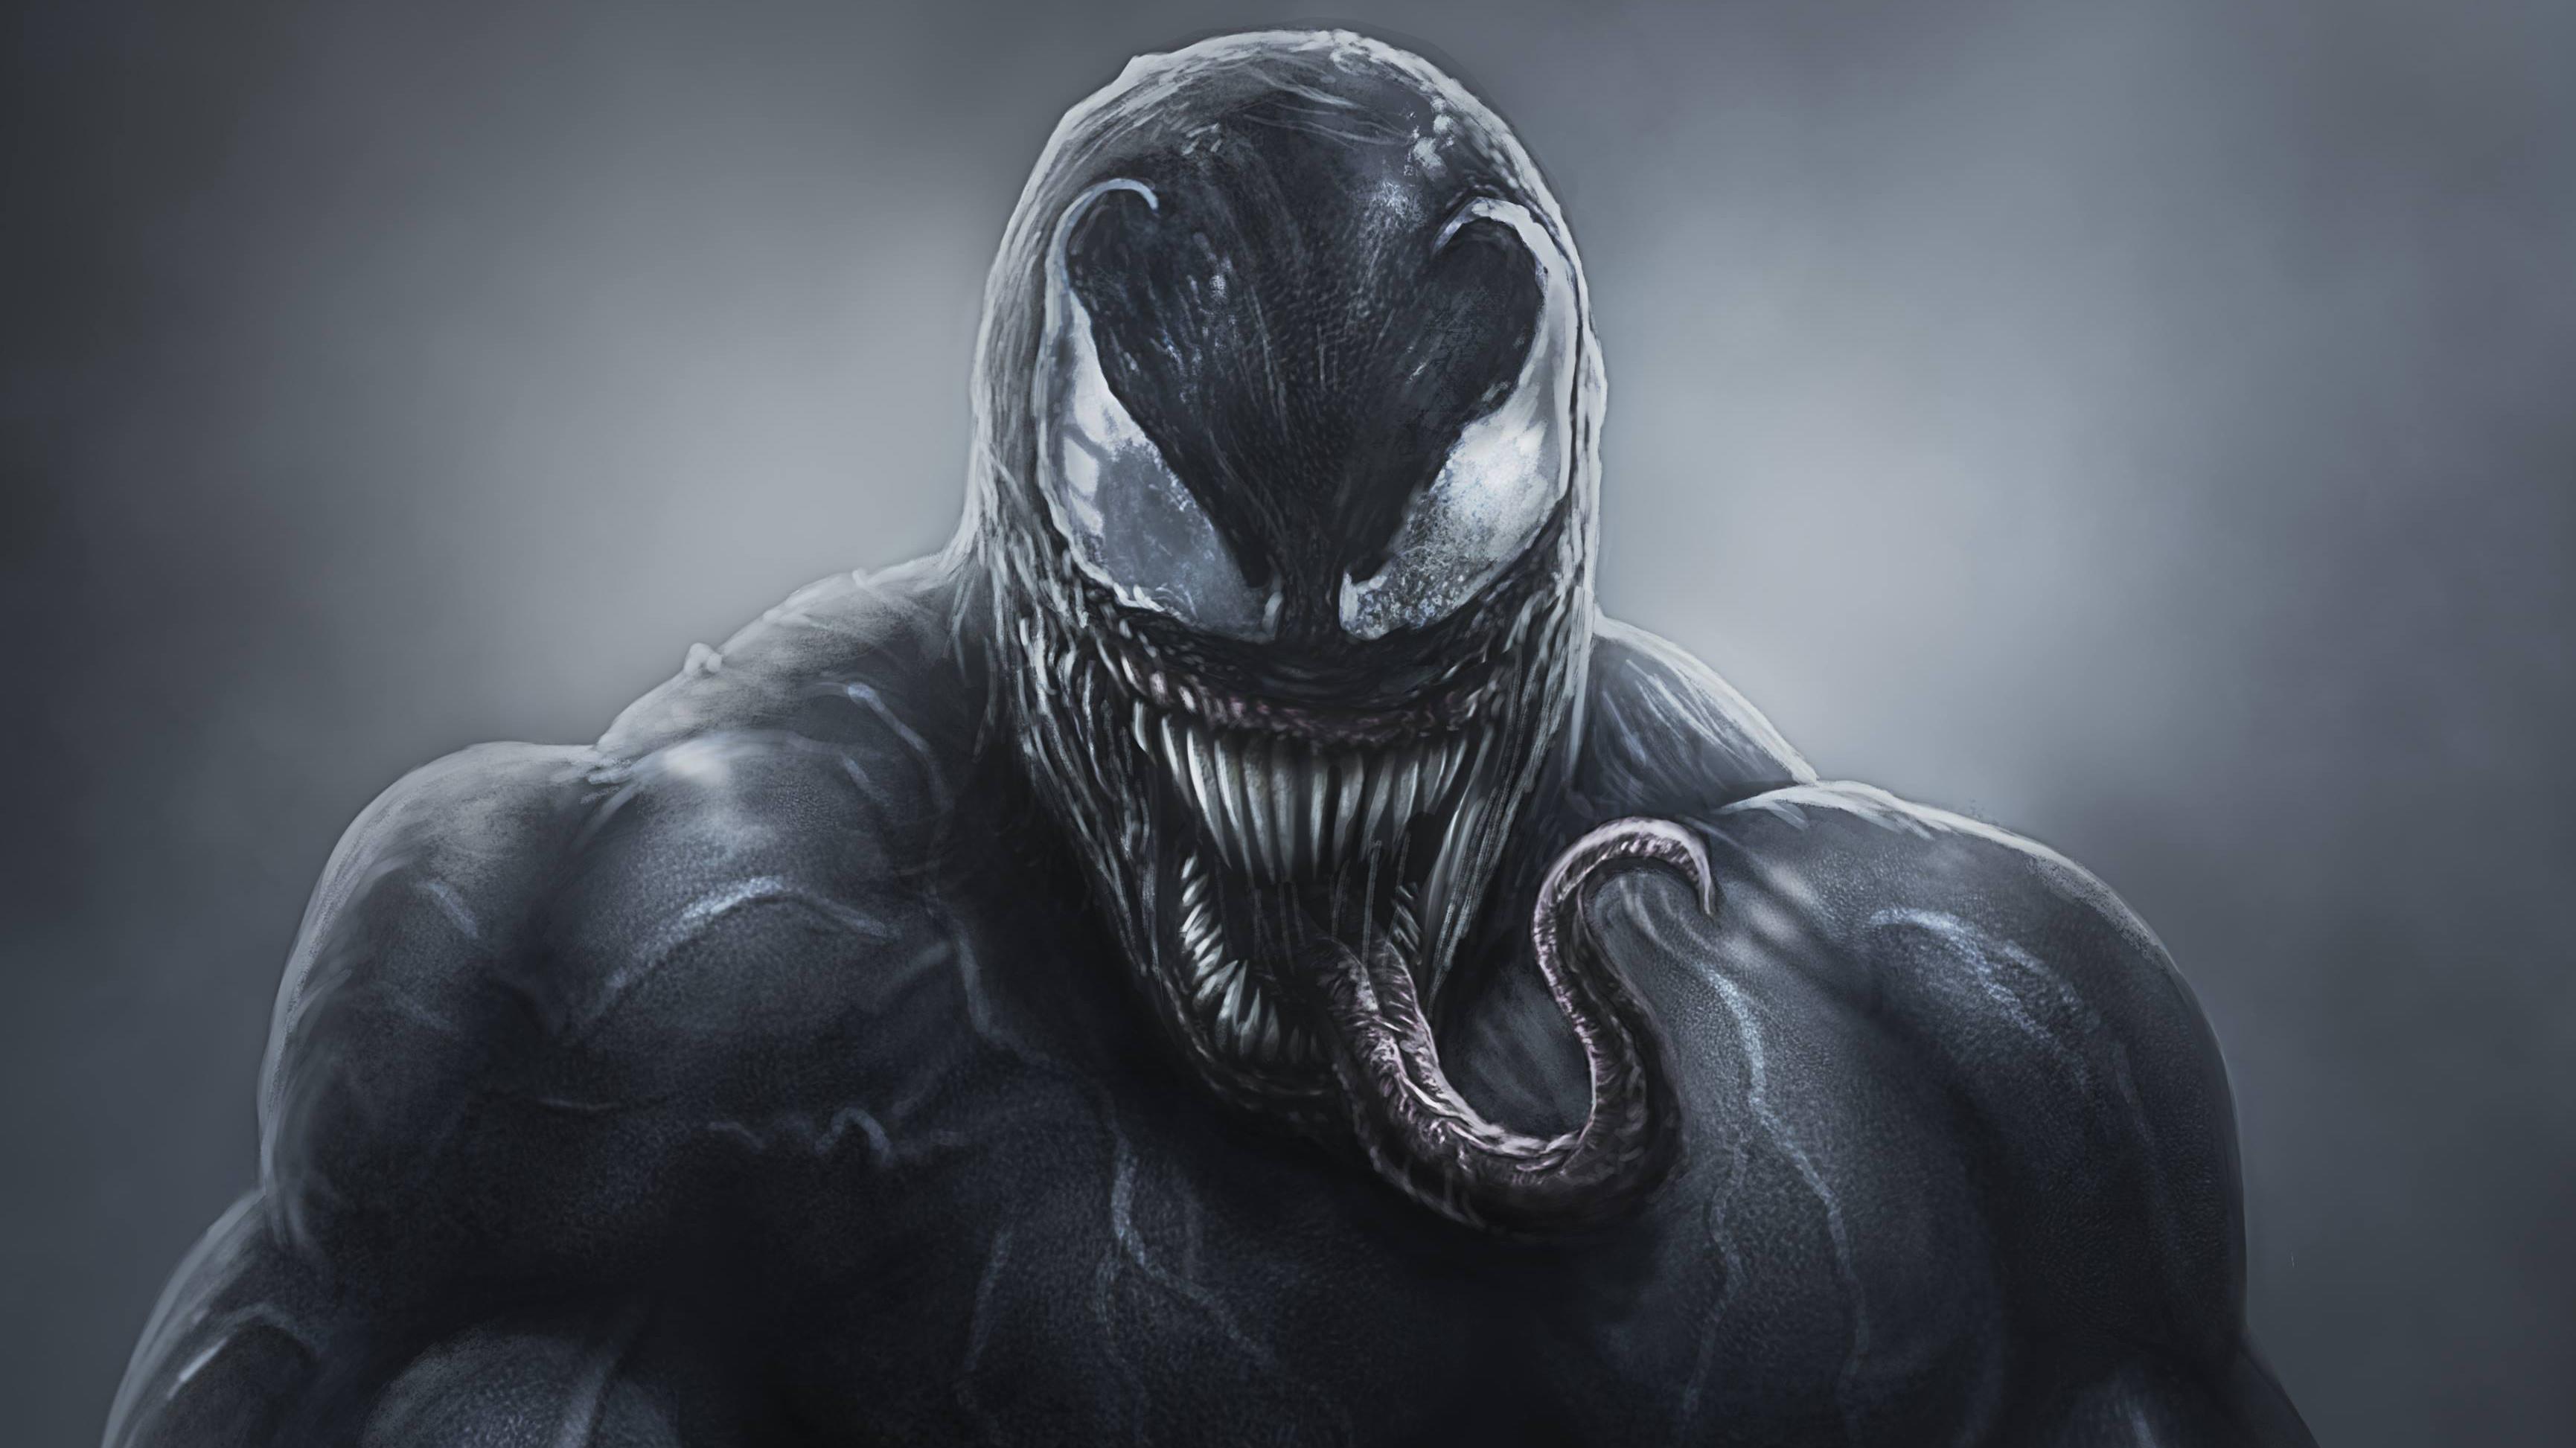 4k venom artwork 2018 hd superheroes 4k wallpapers - 4k wallpaper venom ...